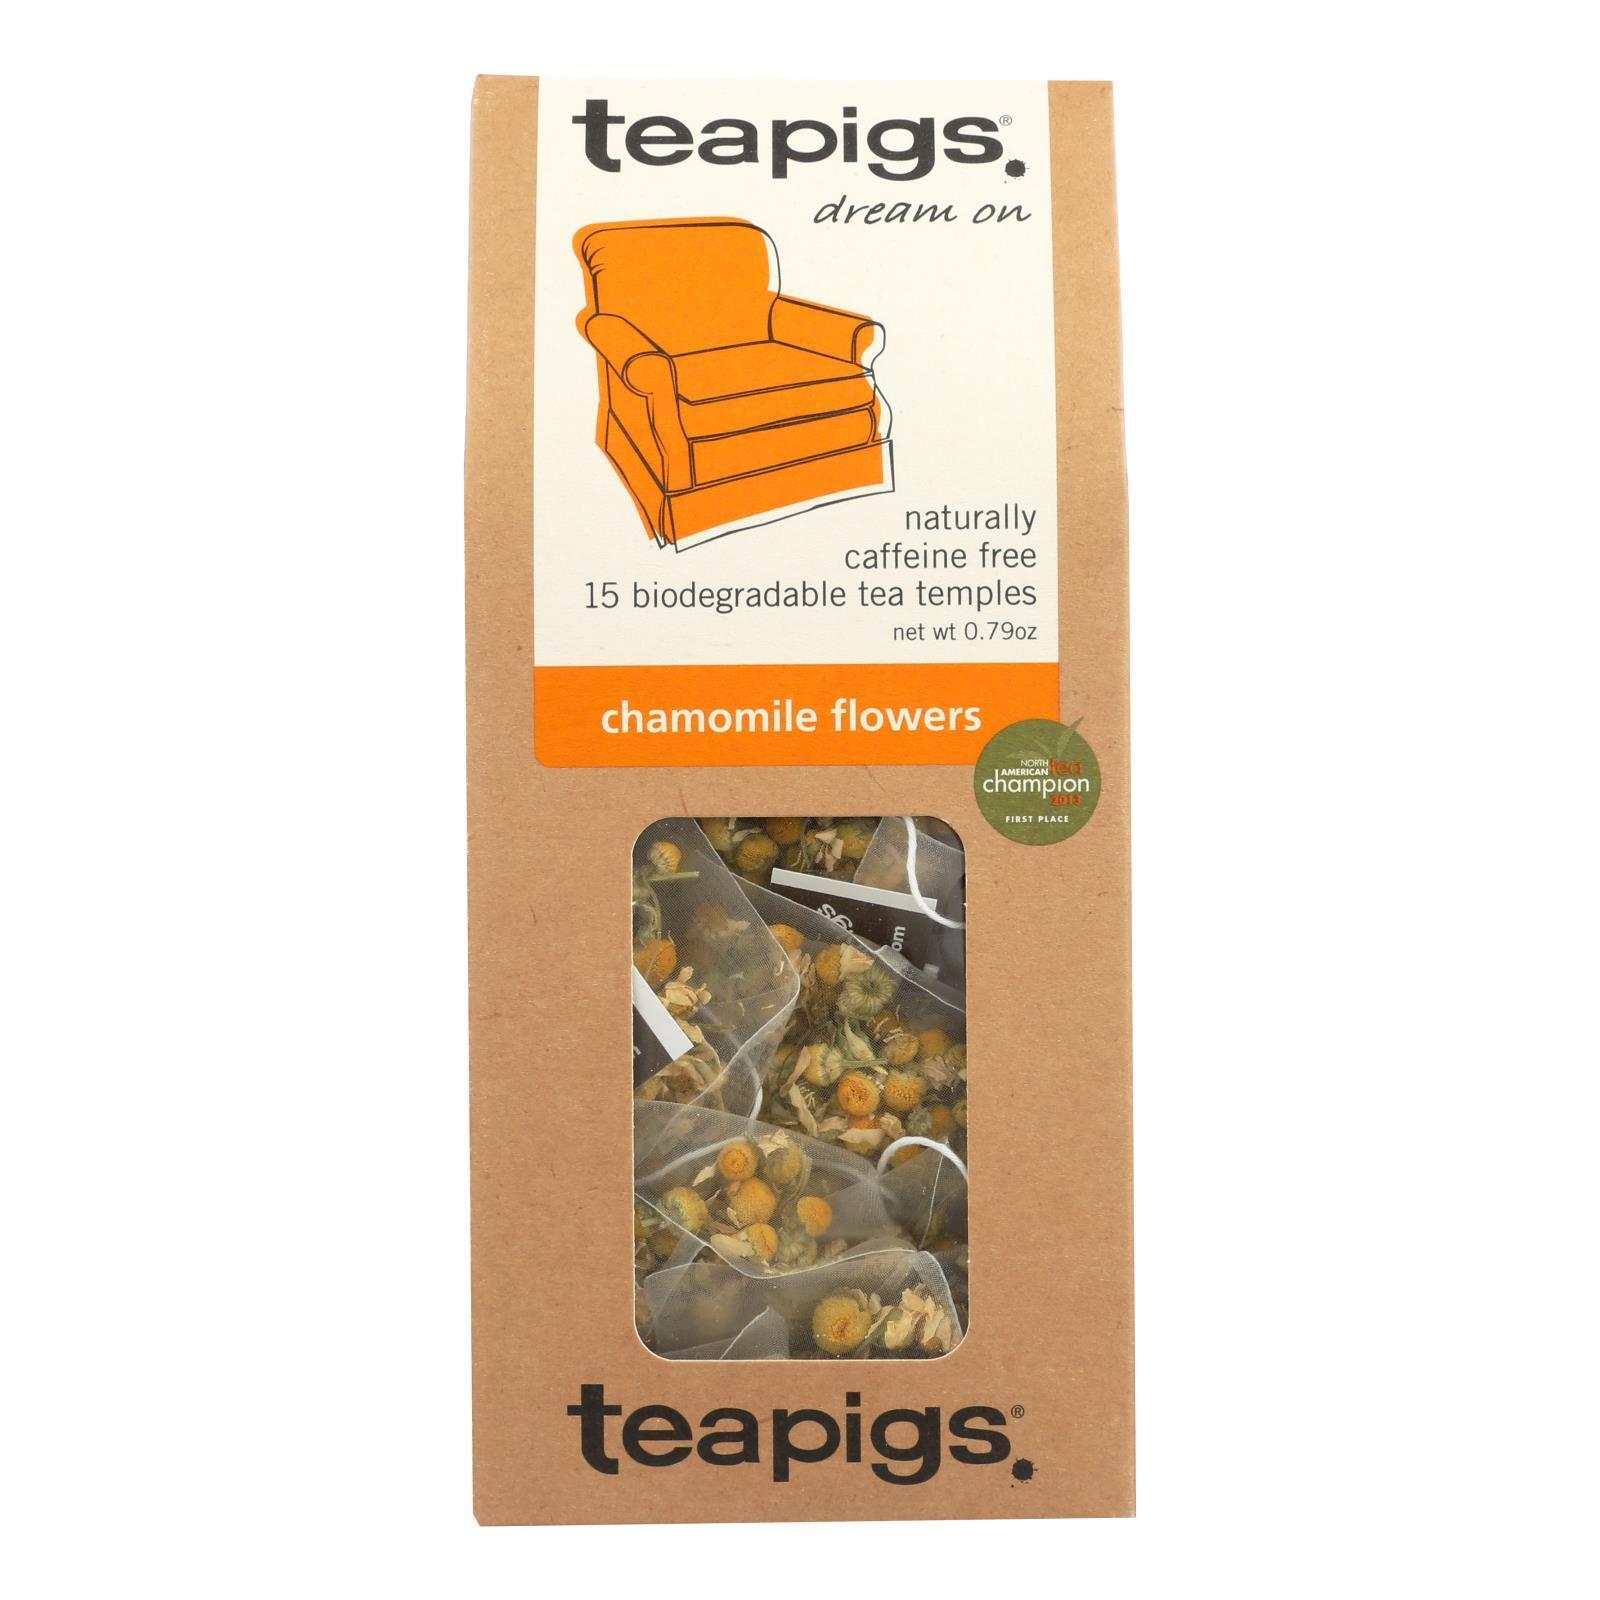 Teapigs Tea - Chamomile Flowers - Case of 6 - 15 count